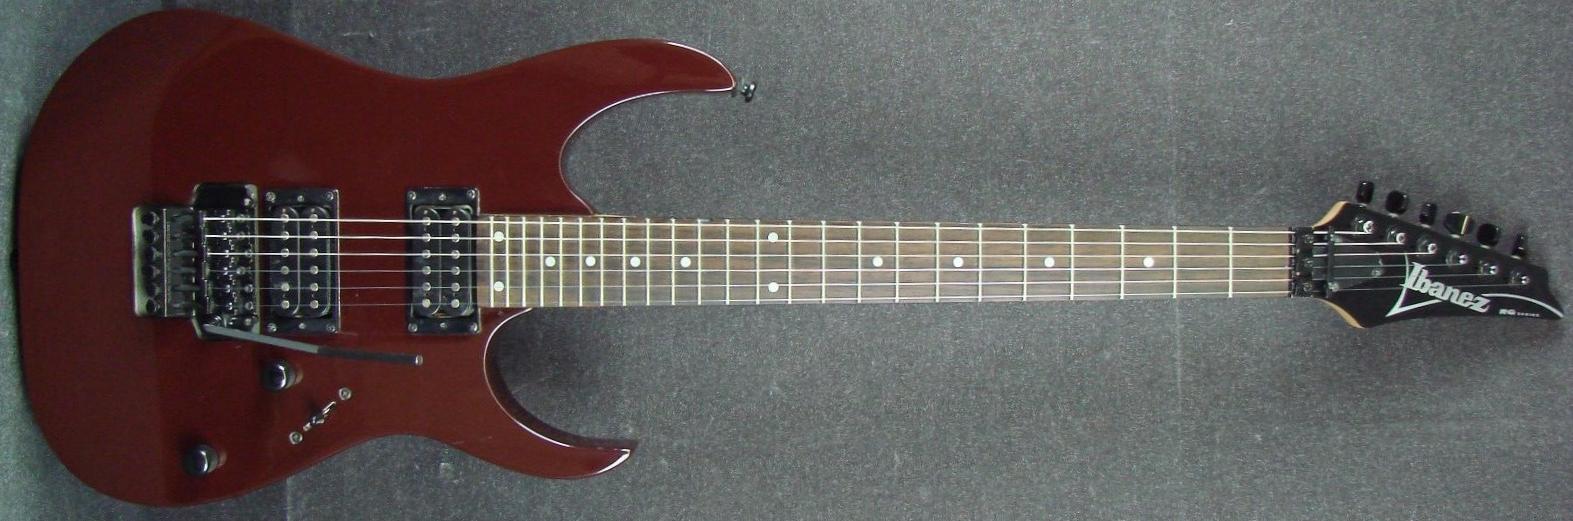 Rg220b Ibanez Wiki Fandom Powered By Wikia Lipstick Guitar Pickup Wiring Diagrams Red